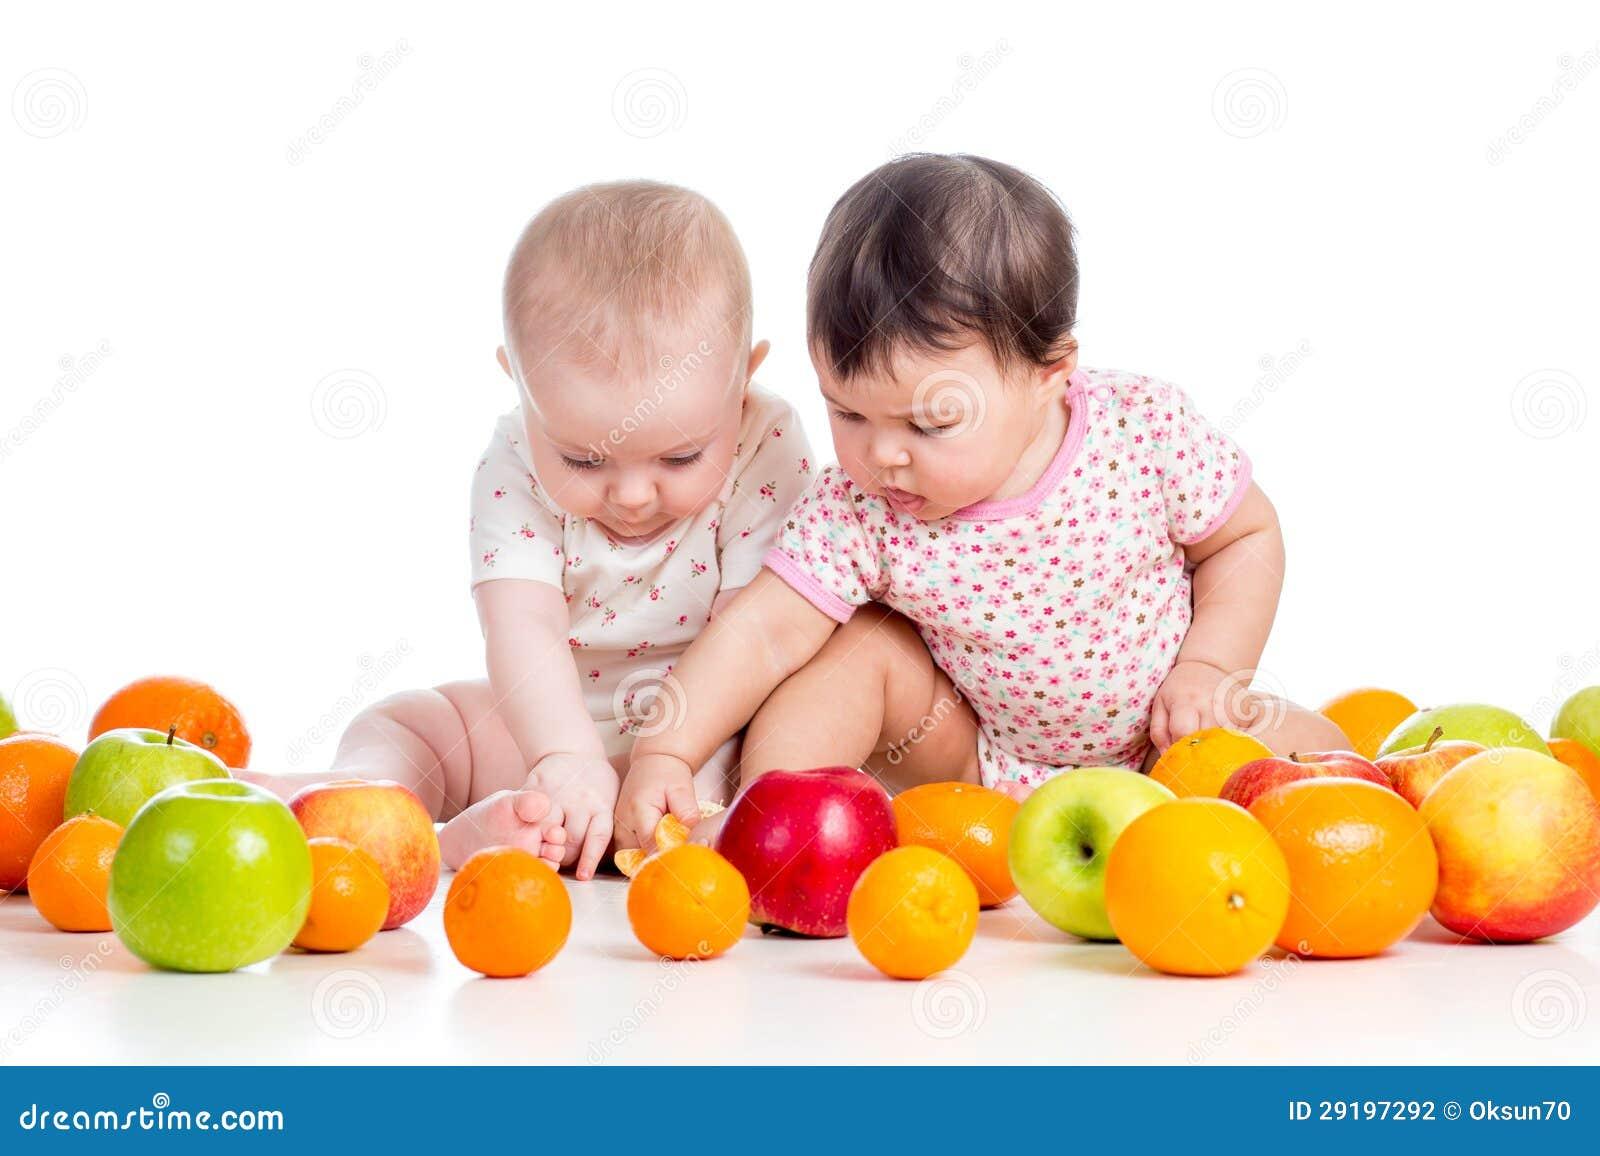 Funny babies eating healthy food fruits